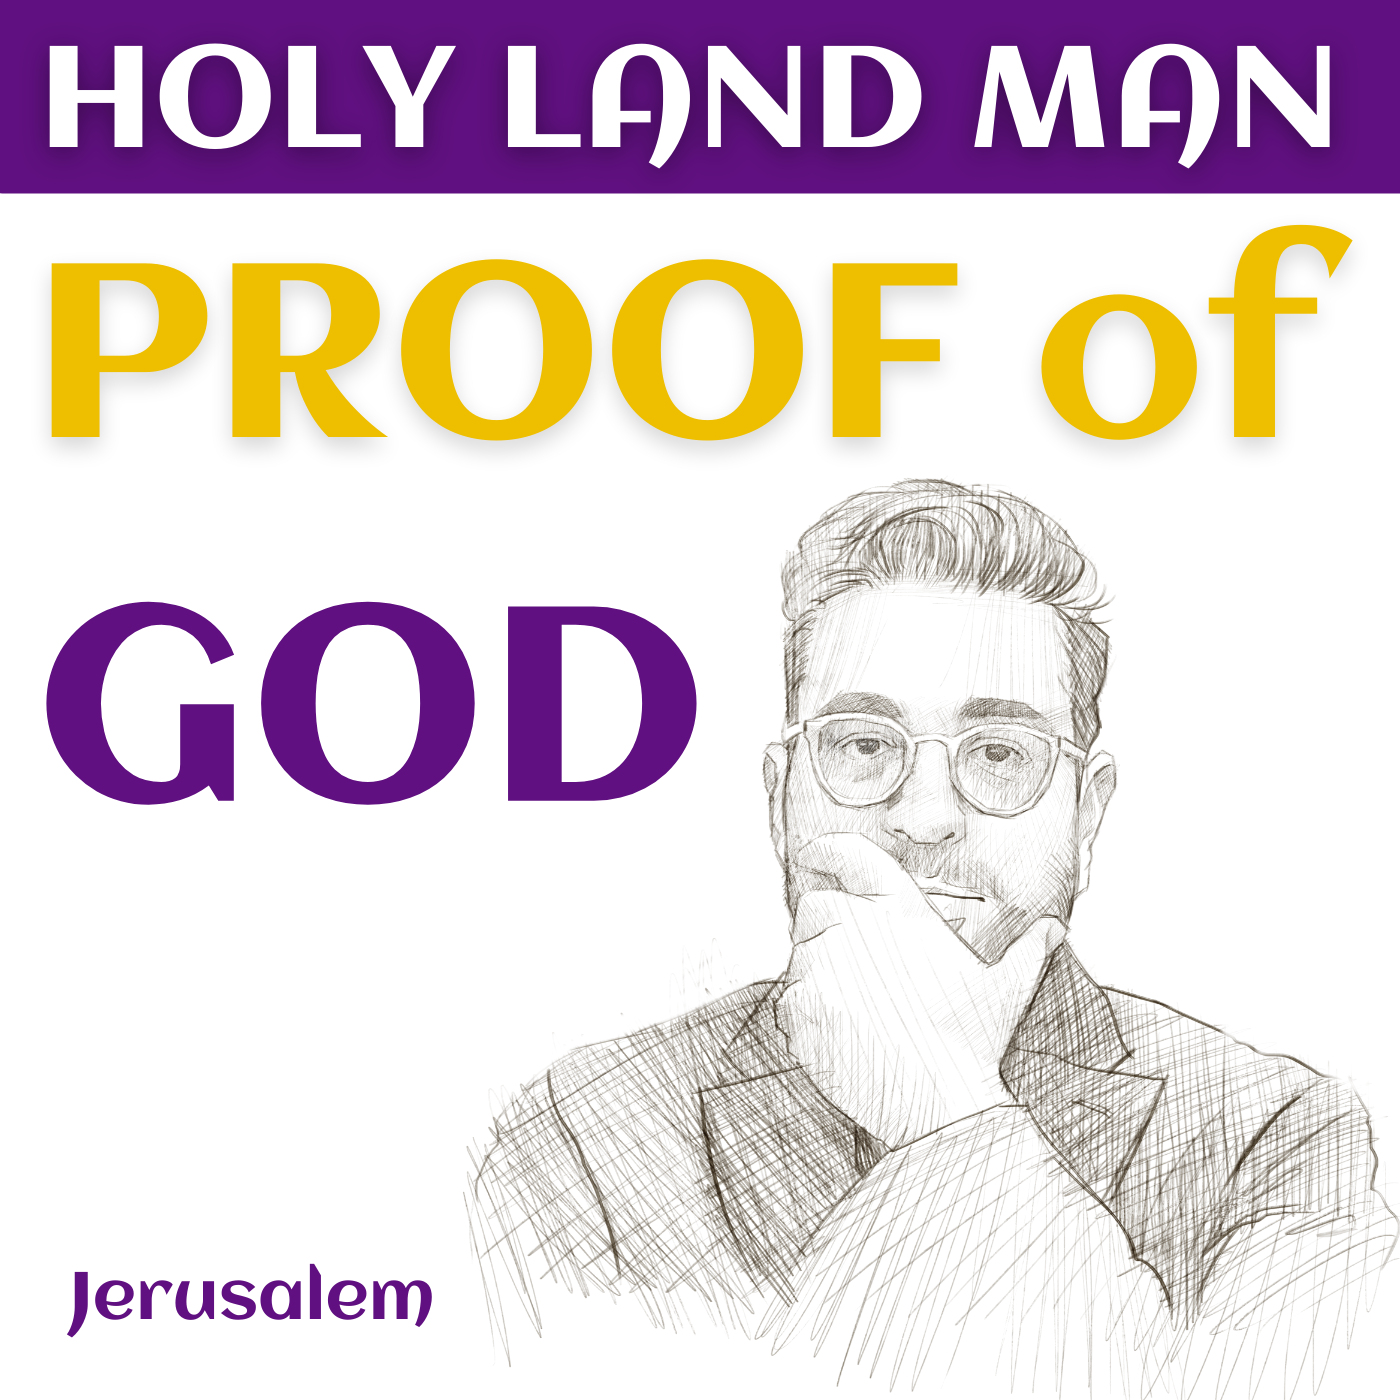 Don Juravin | Biblical MENTOR of Life, Relationships, Humor, Bible, Health